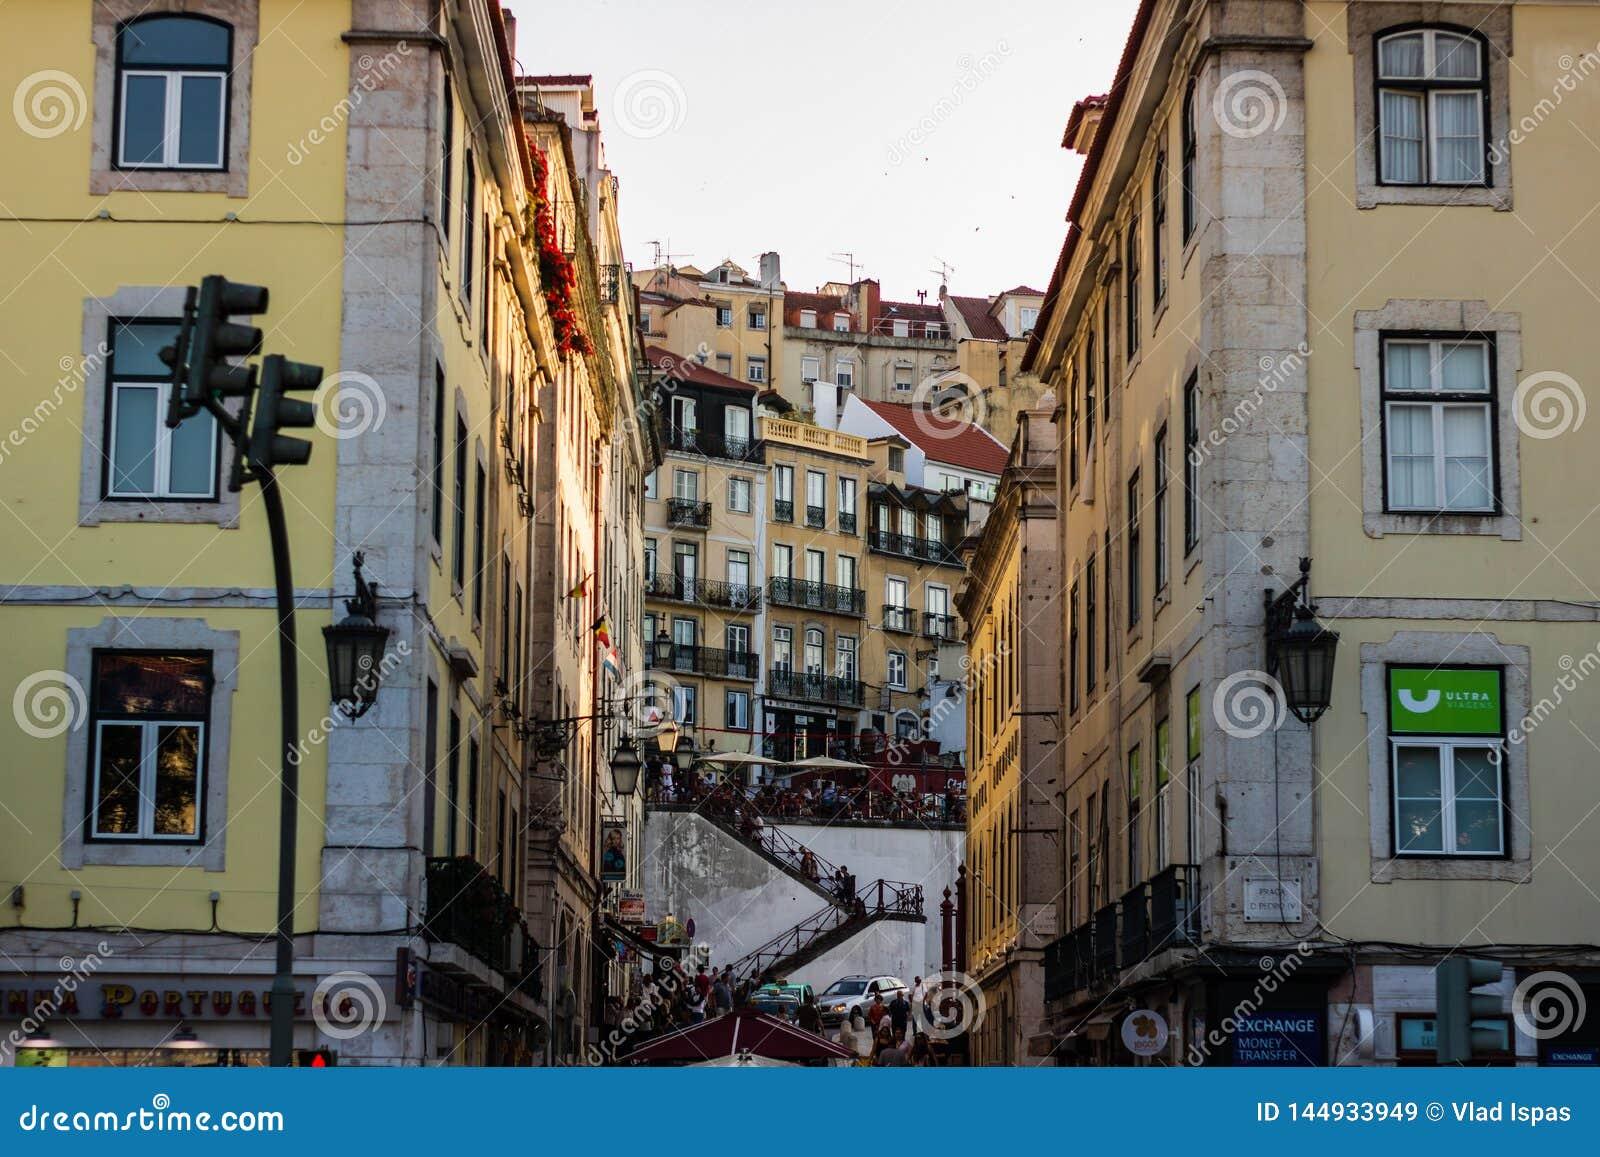 E Restaurante local e as escadas que vão ao alto do bairro de Lisboa